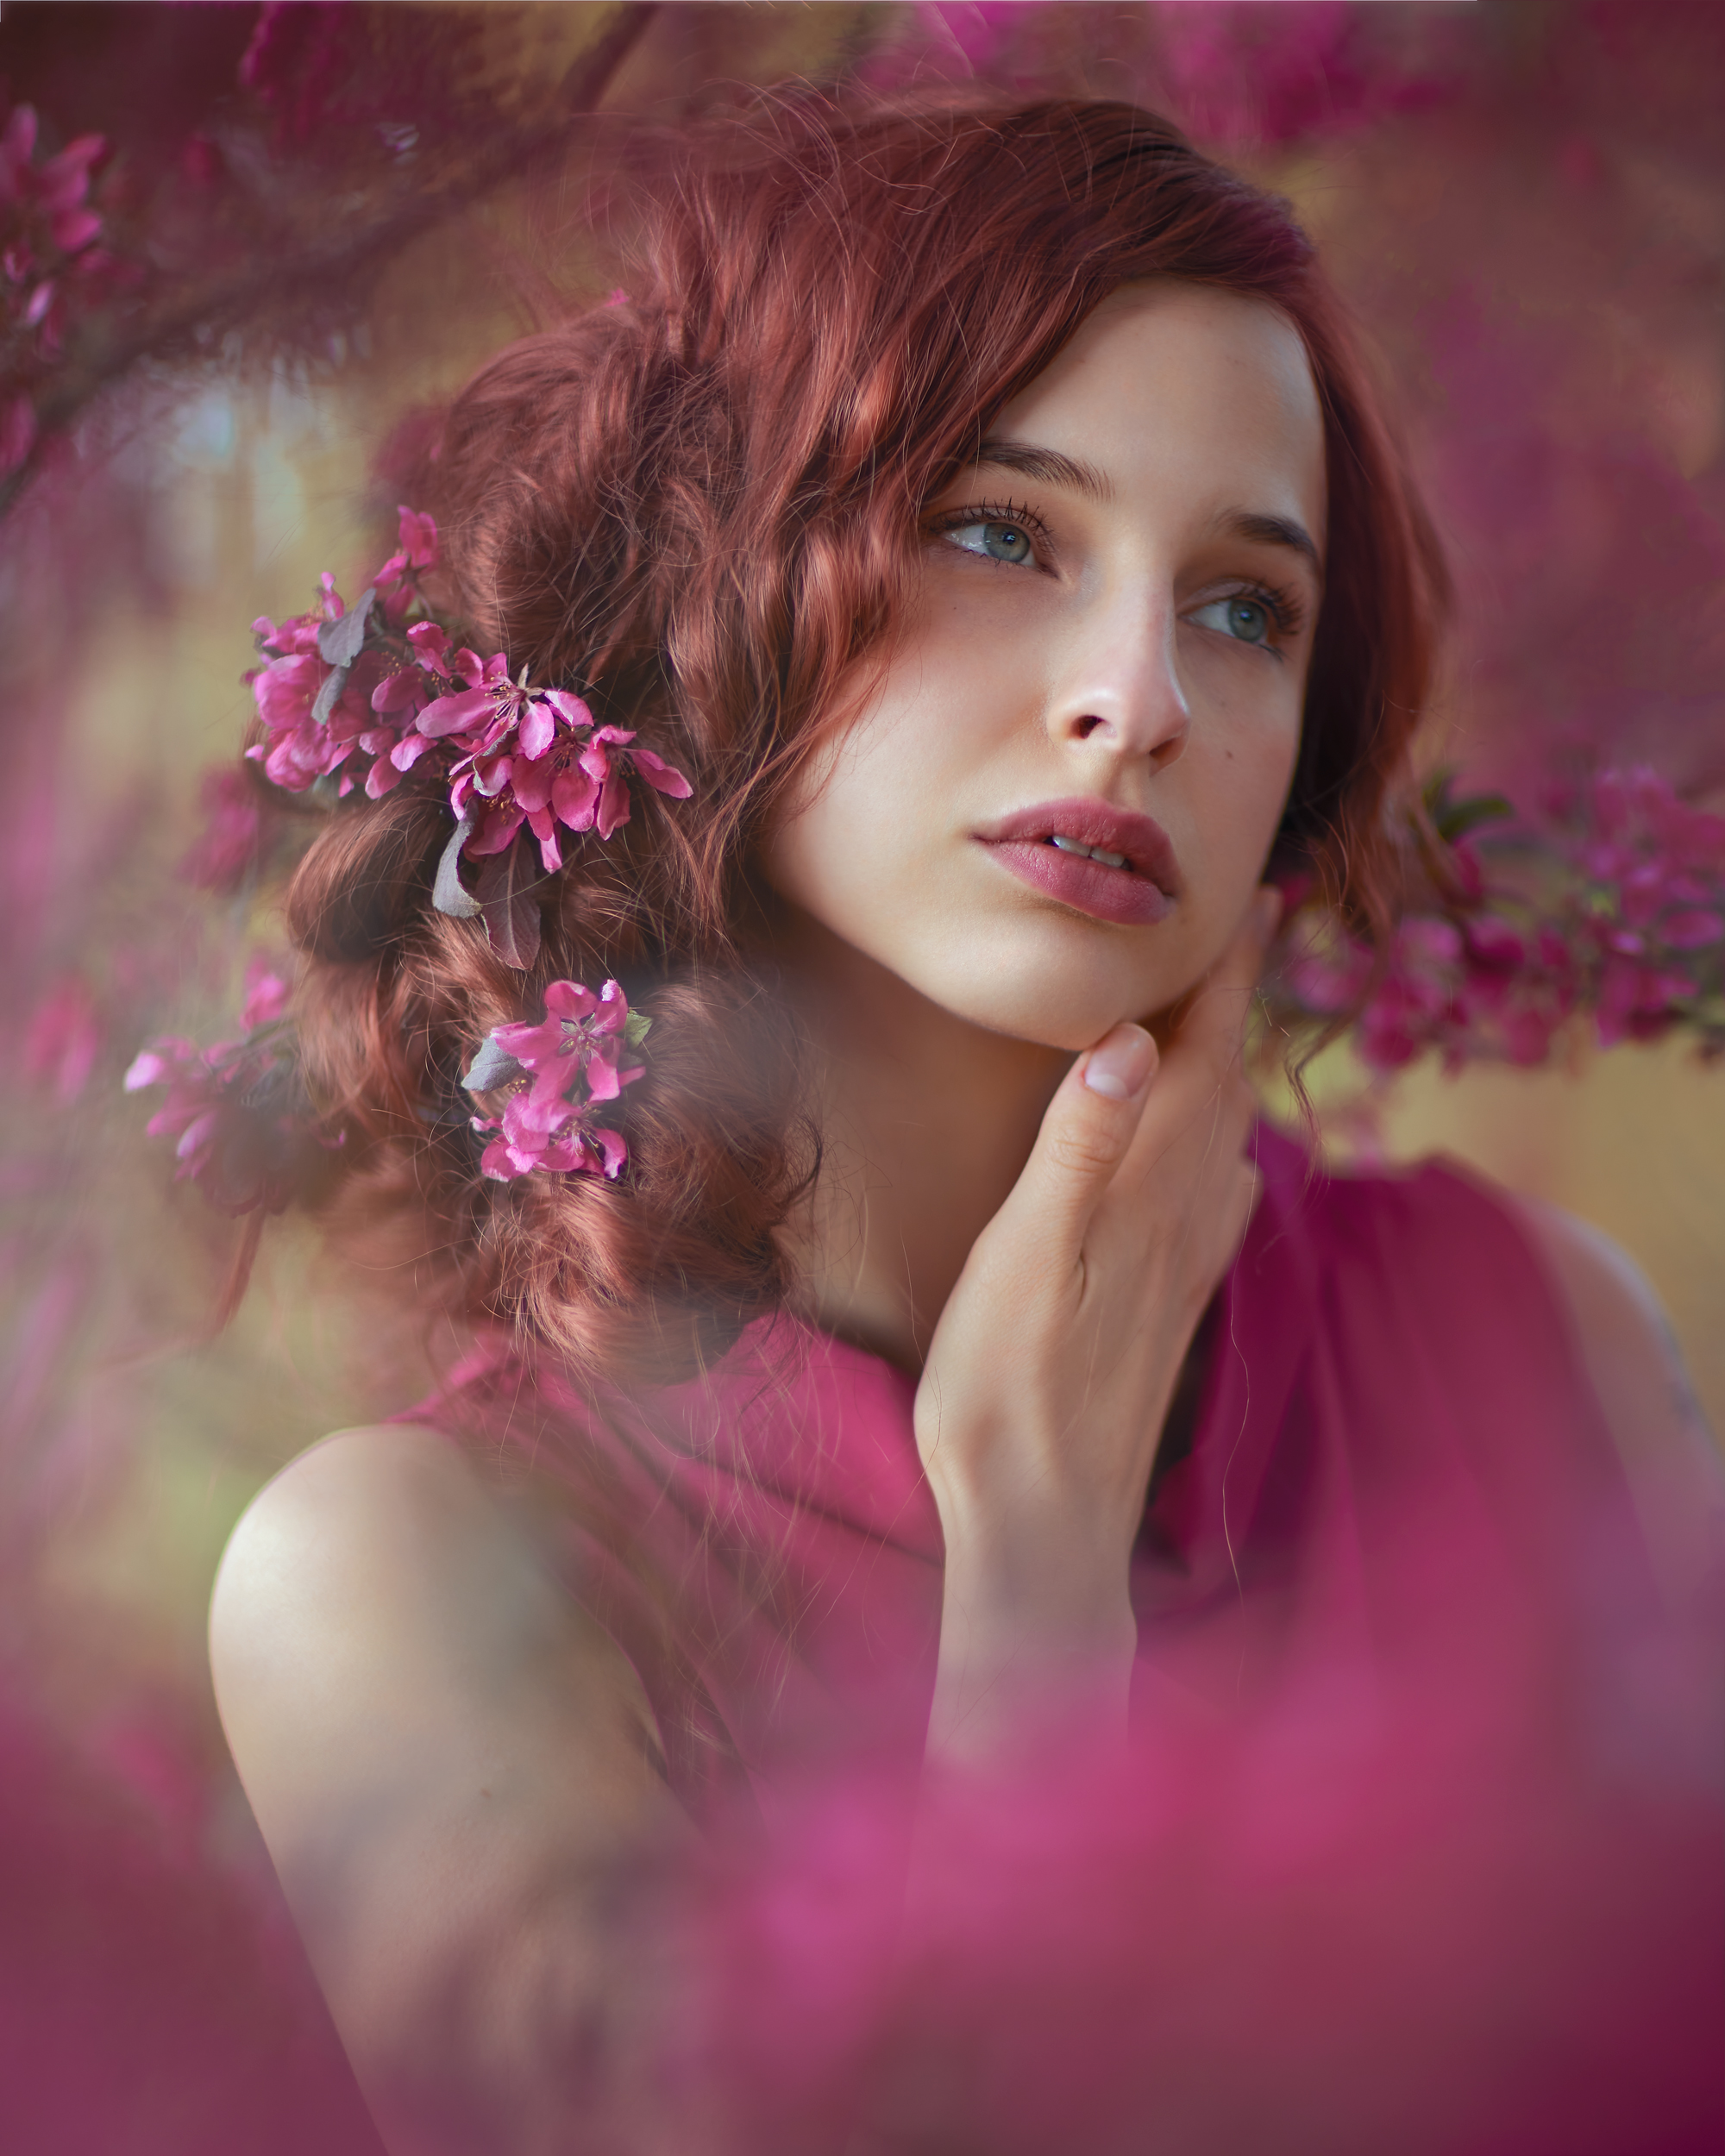 яблоня, маджента, рыжеволосая, Seitner Natalie